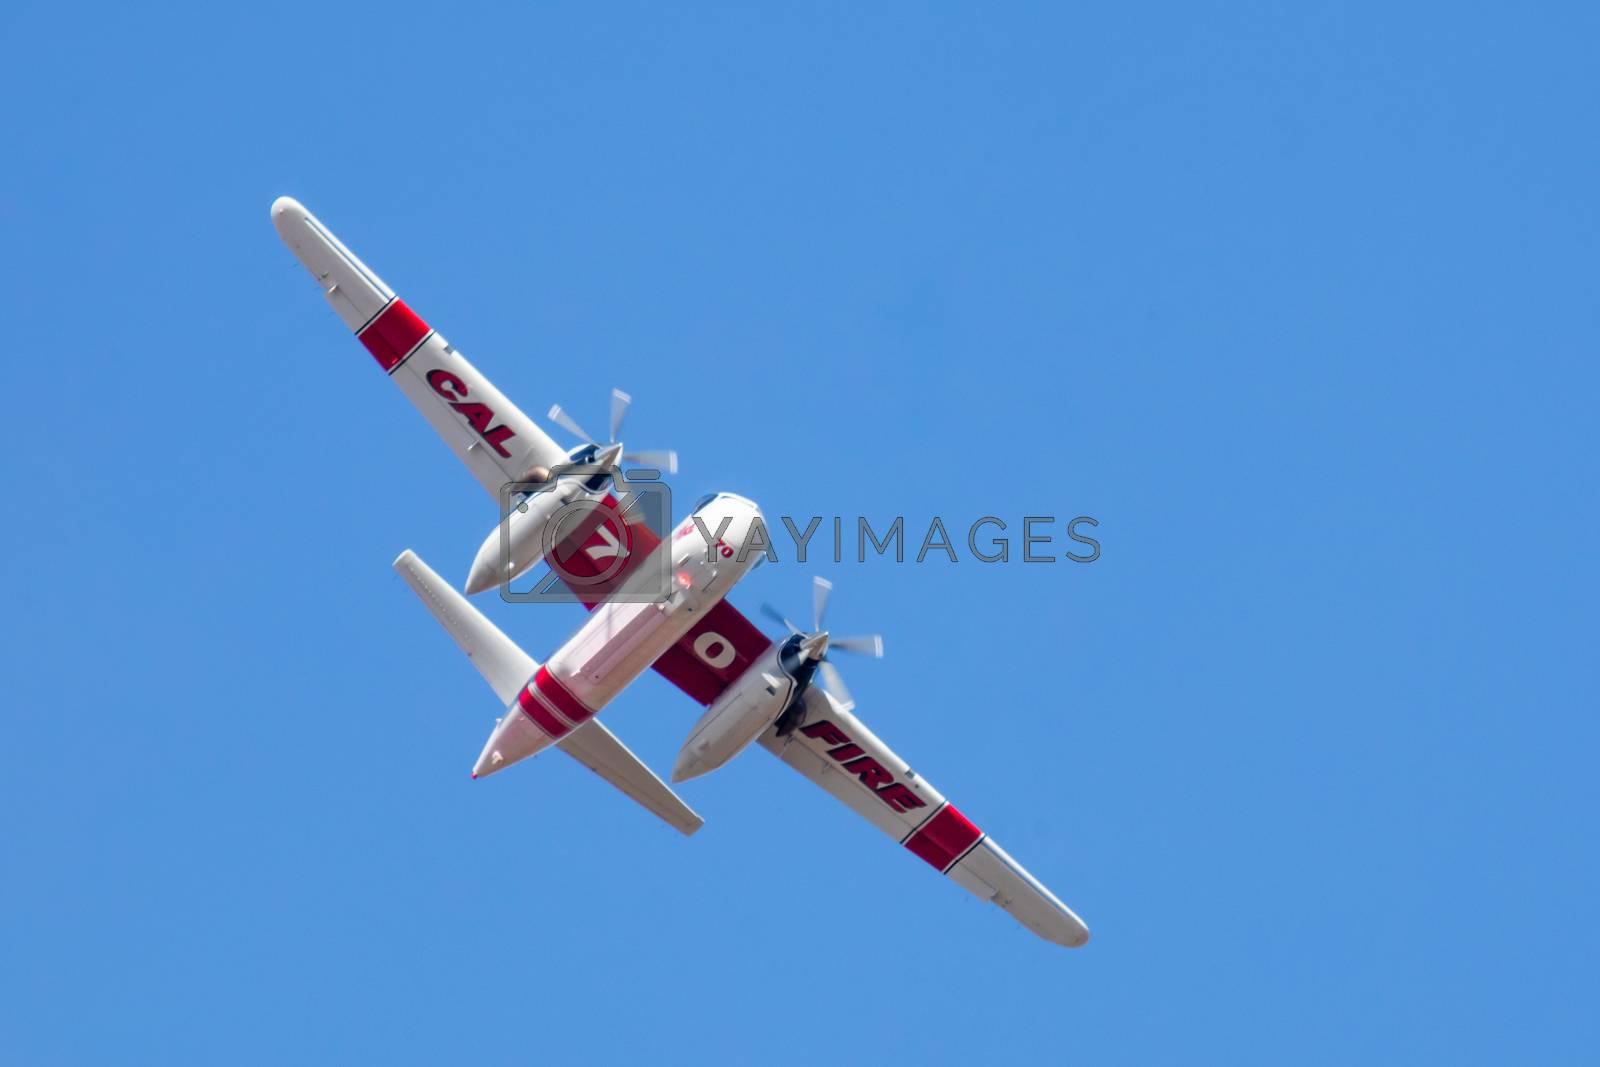 Winchester, CA USA - June 14, 2020: Cal Fire aircraft preparingto drop fire retardant on a dry hilltop wildfire near Winchester, California.